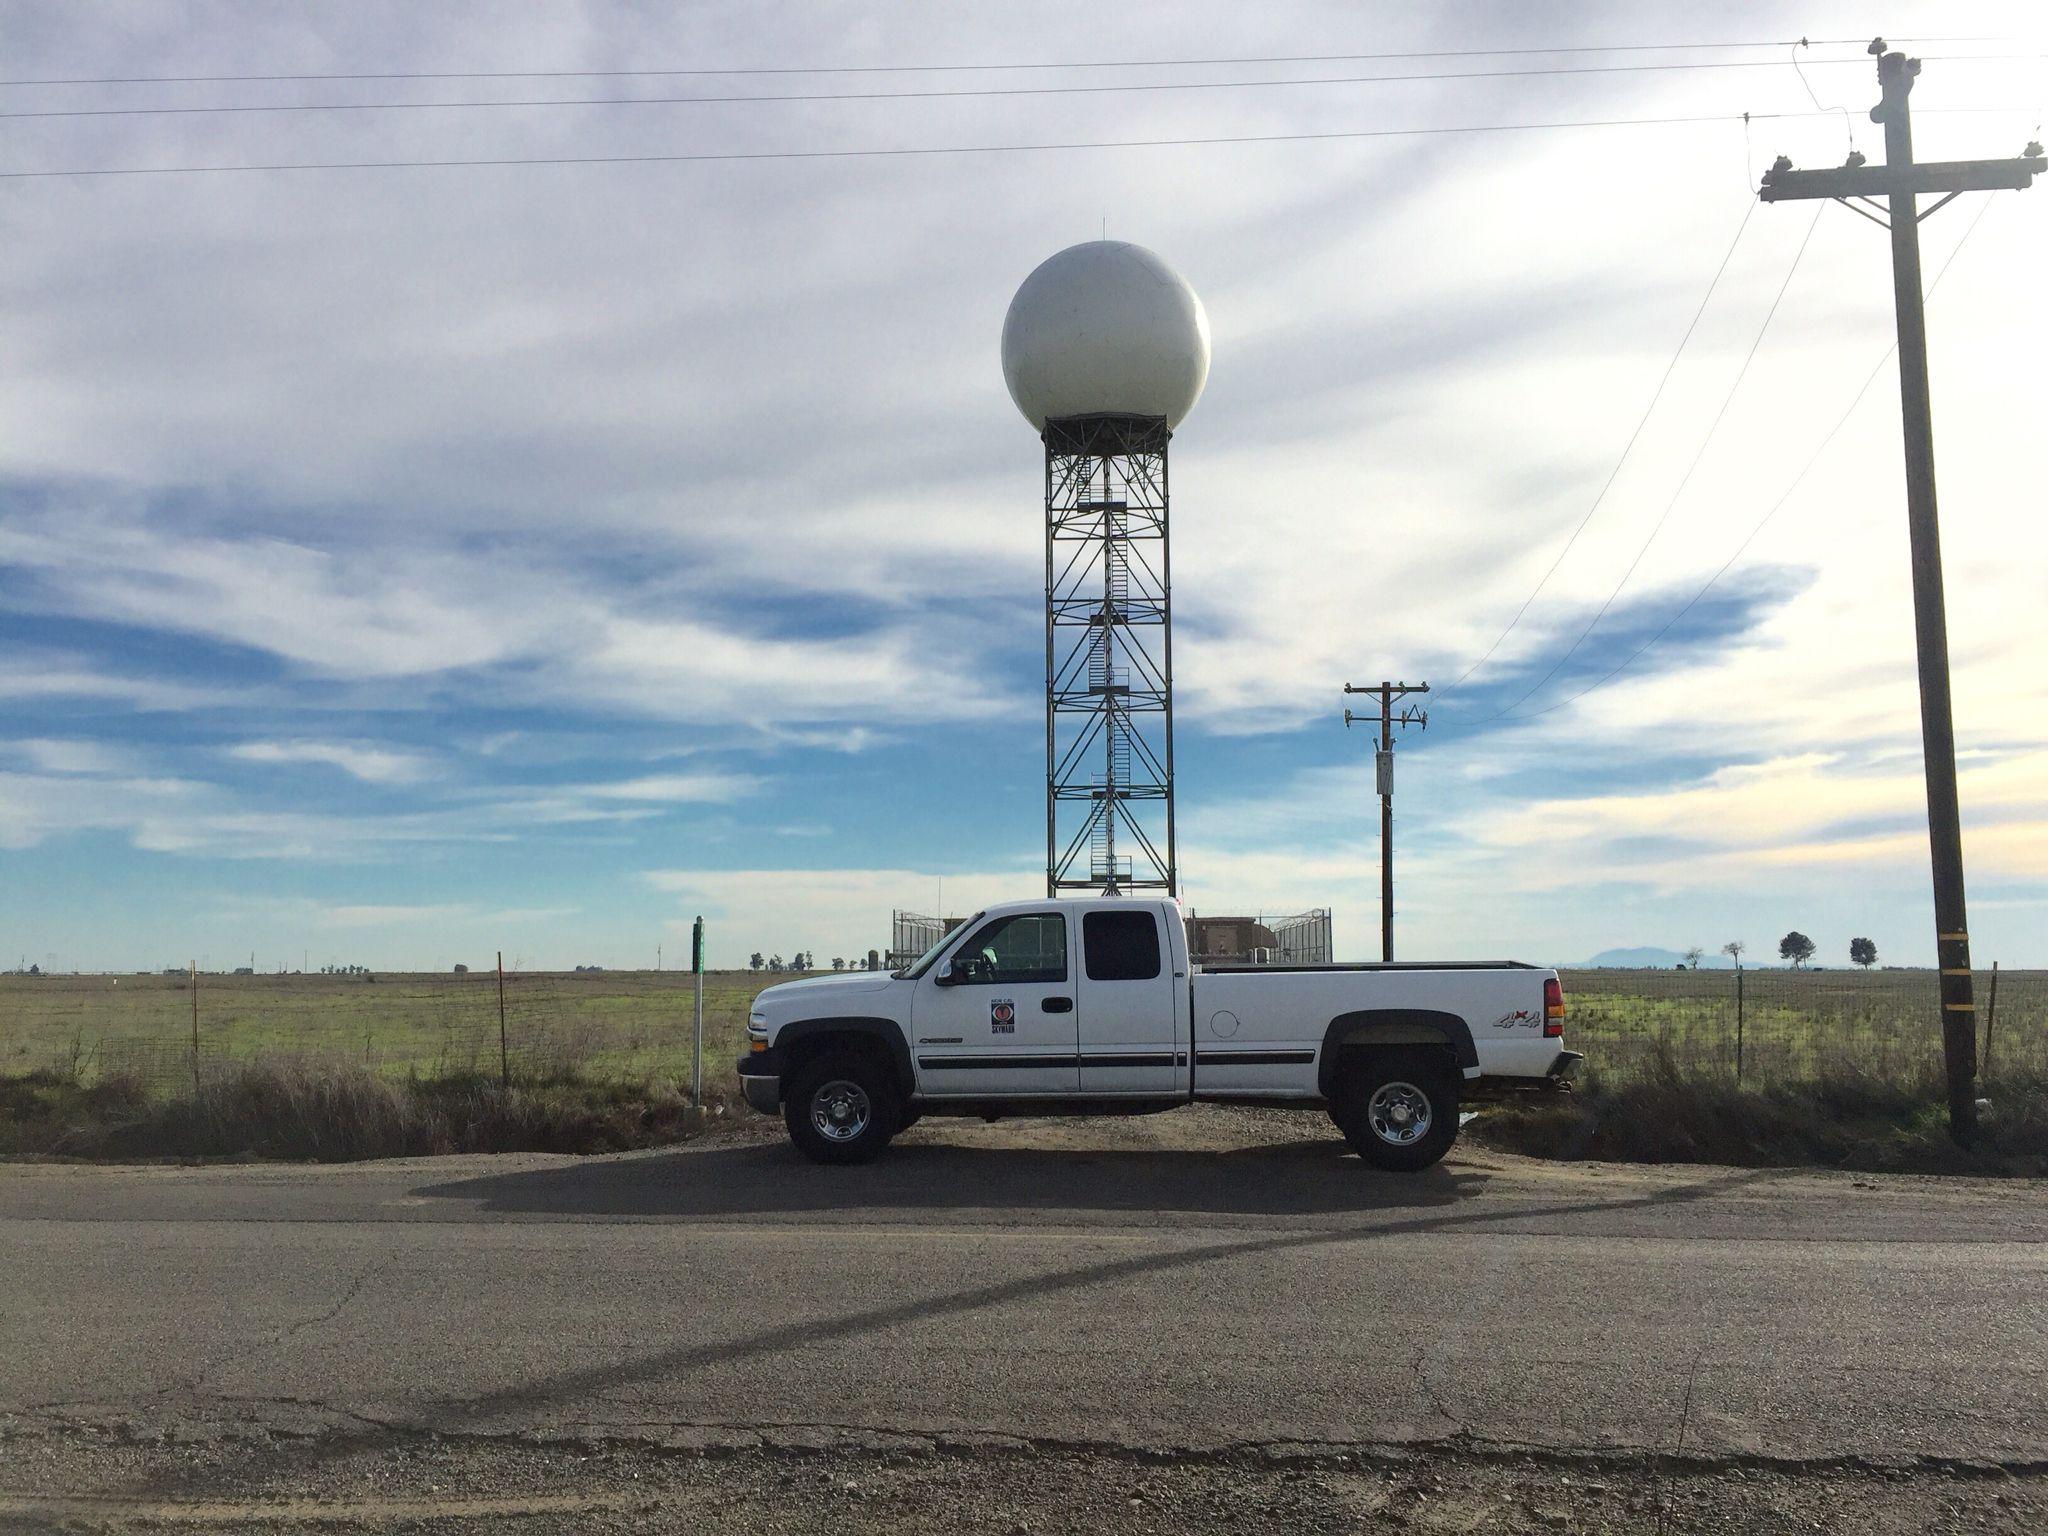 National weather service doppler radar kdax near davis